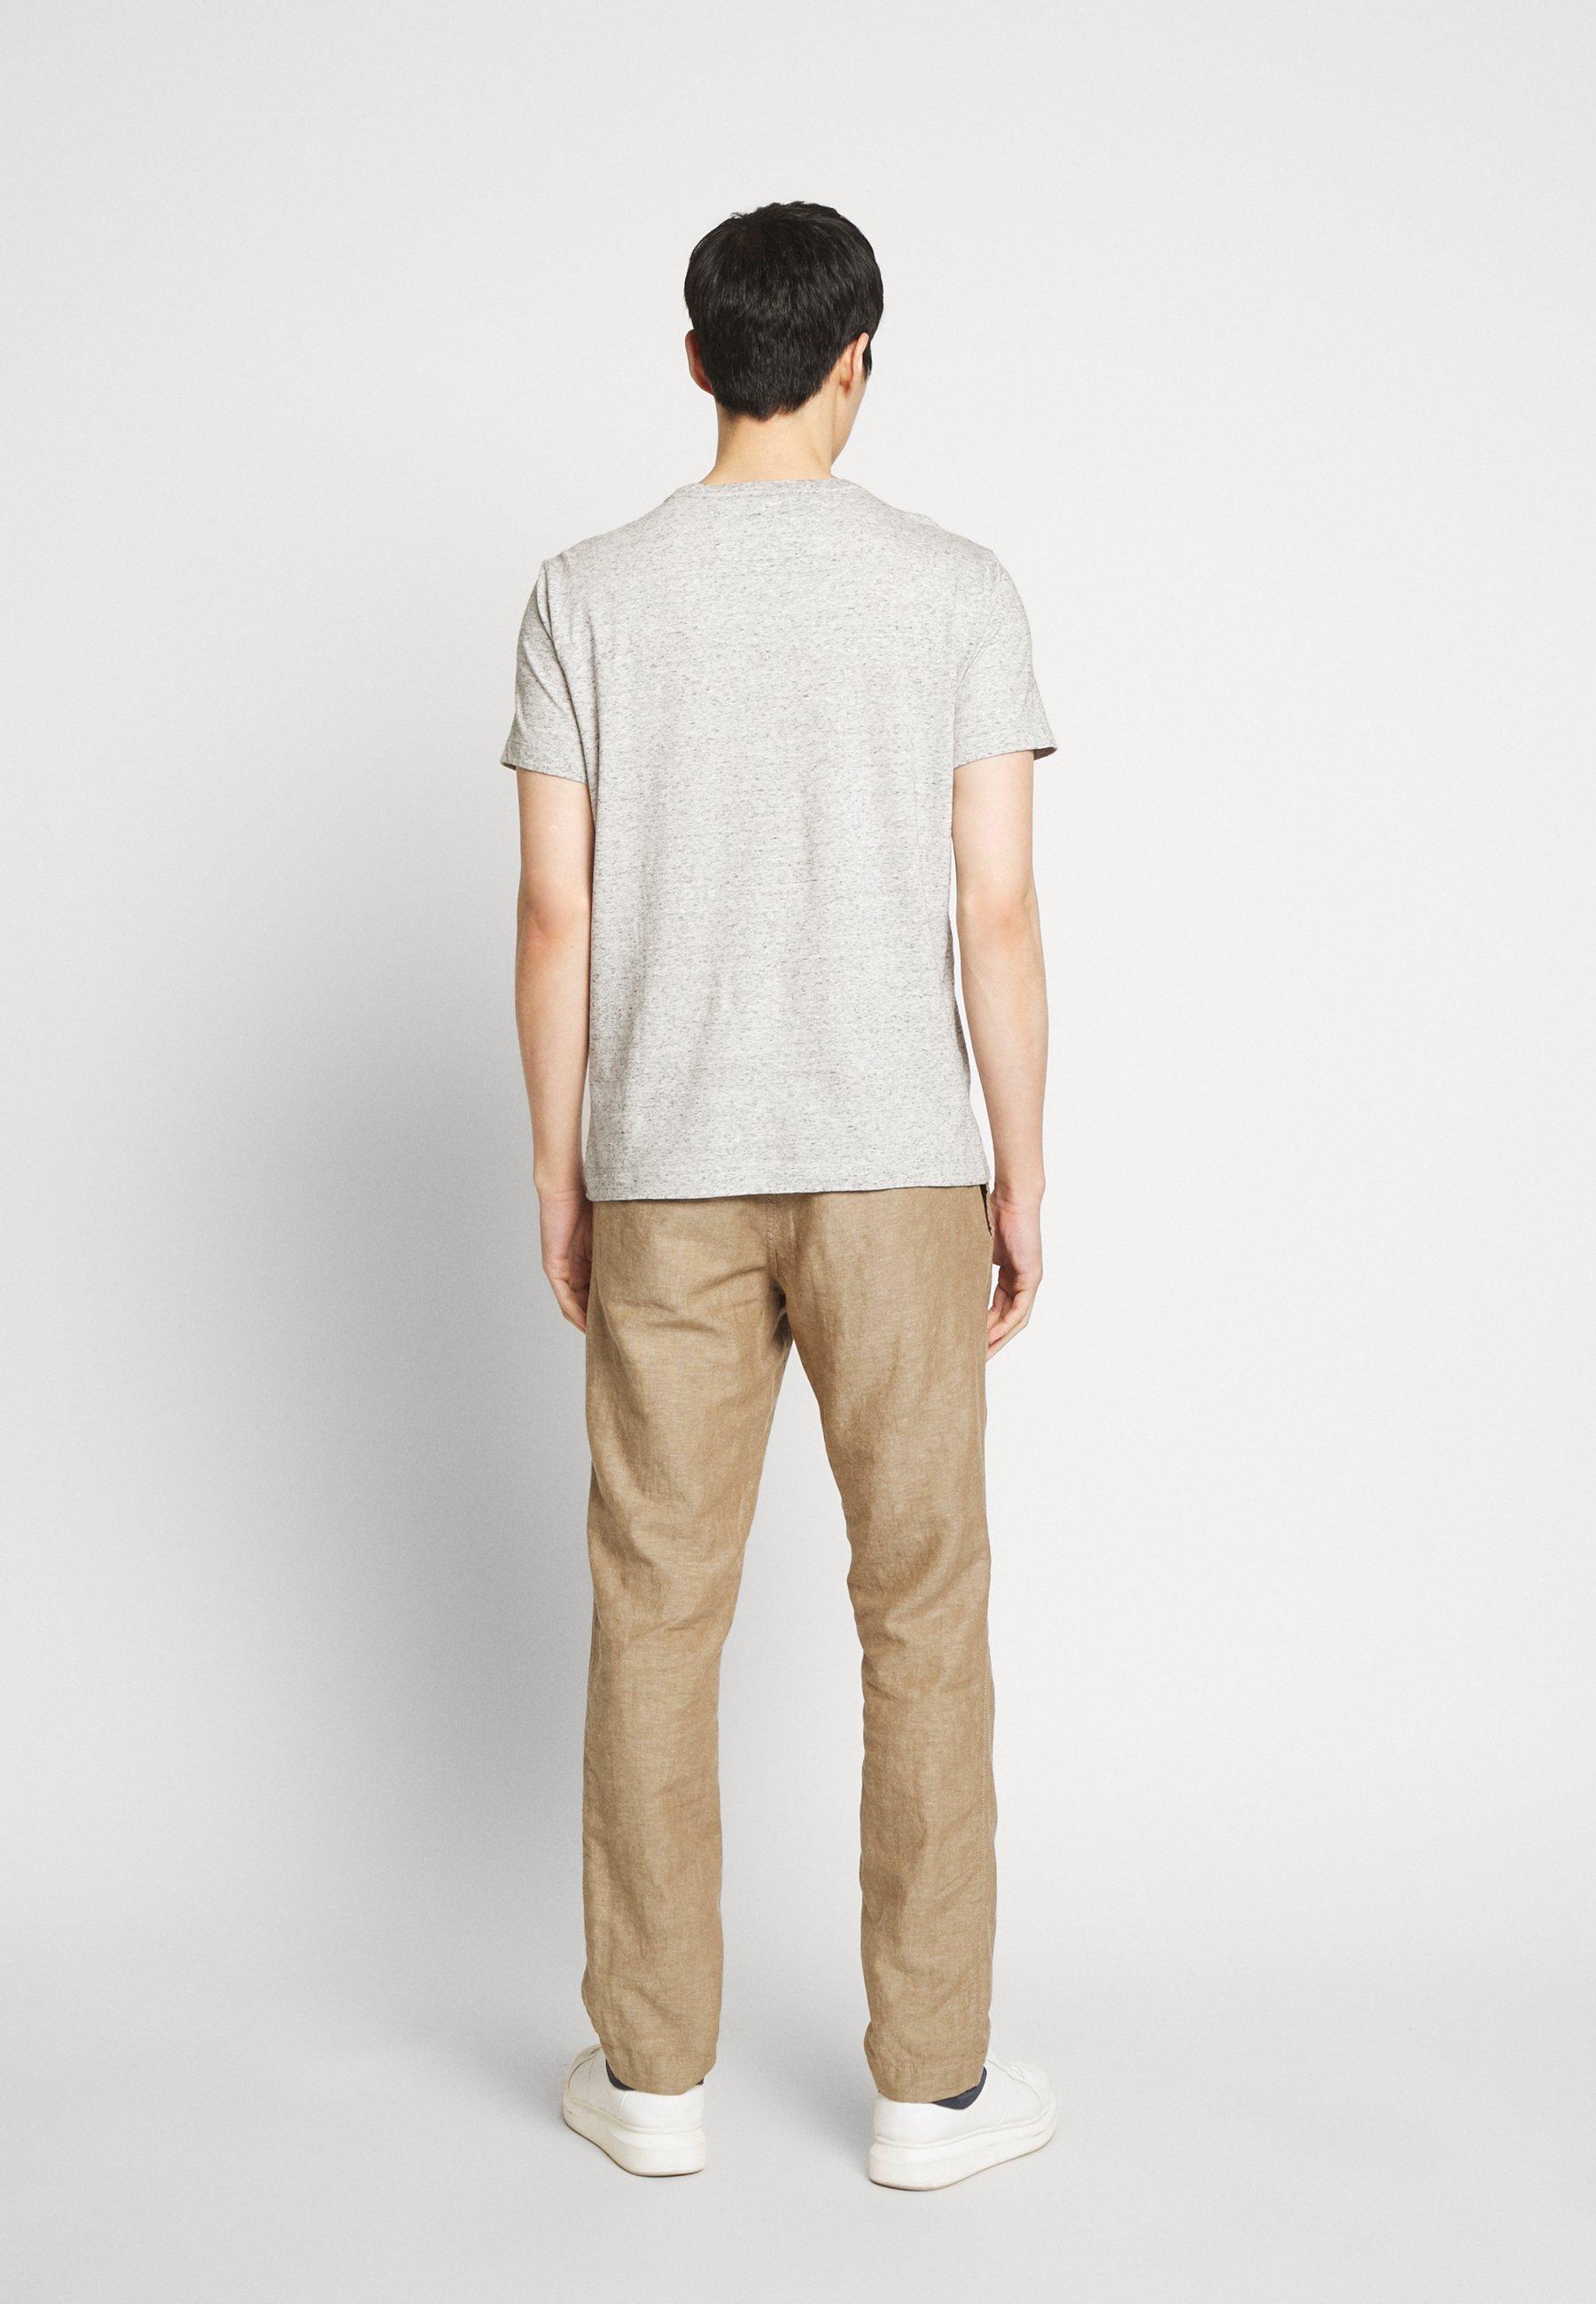 GAP NEW SLIM PANTS Bukse beige Zalando.no